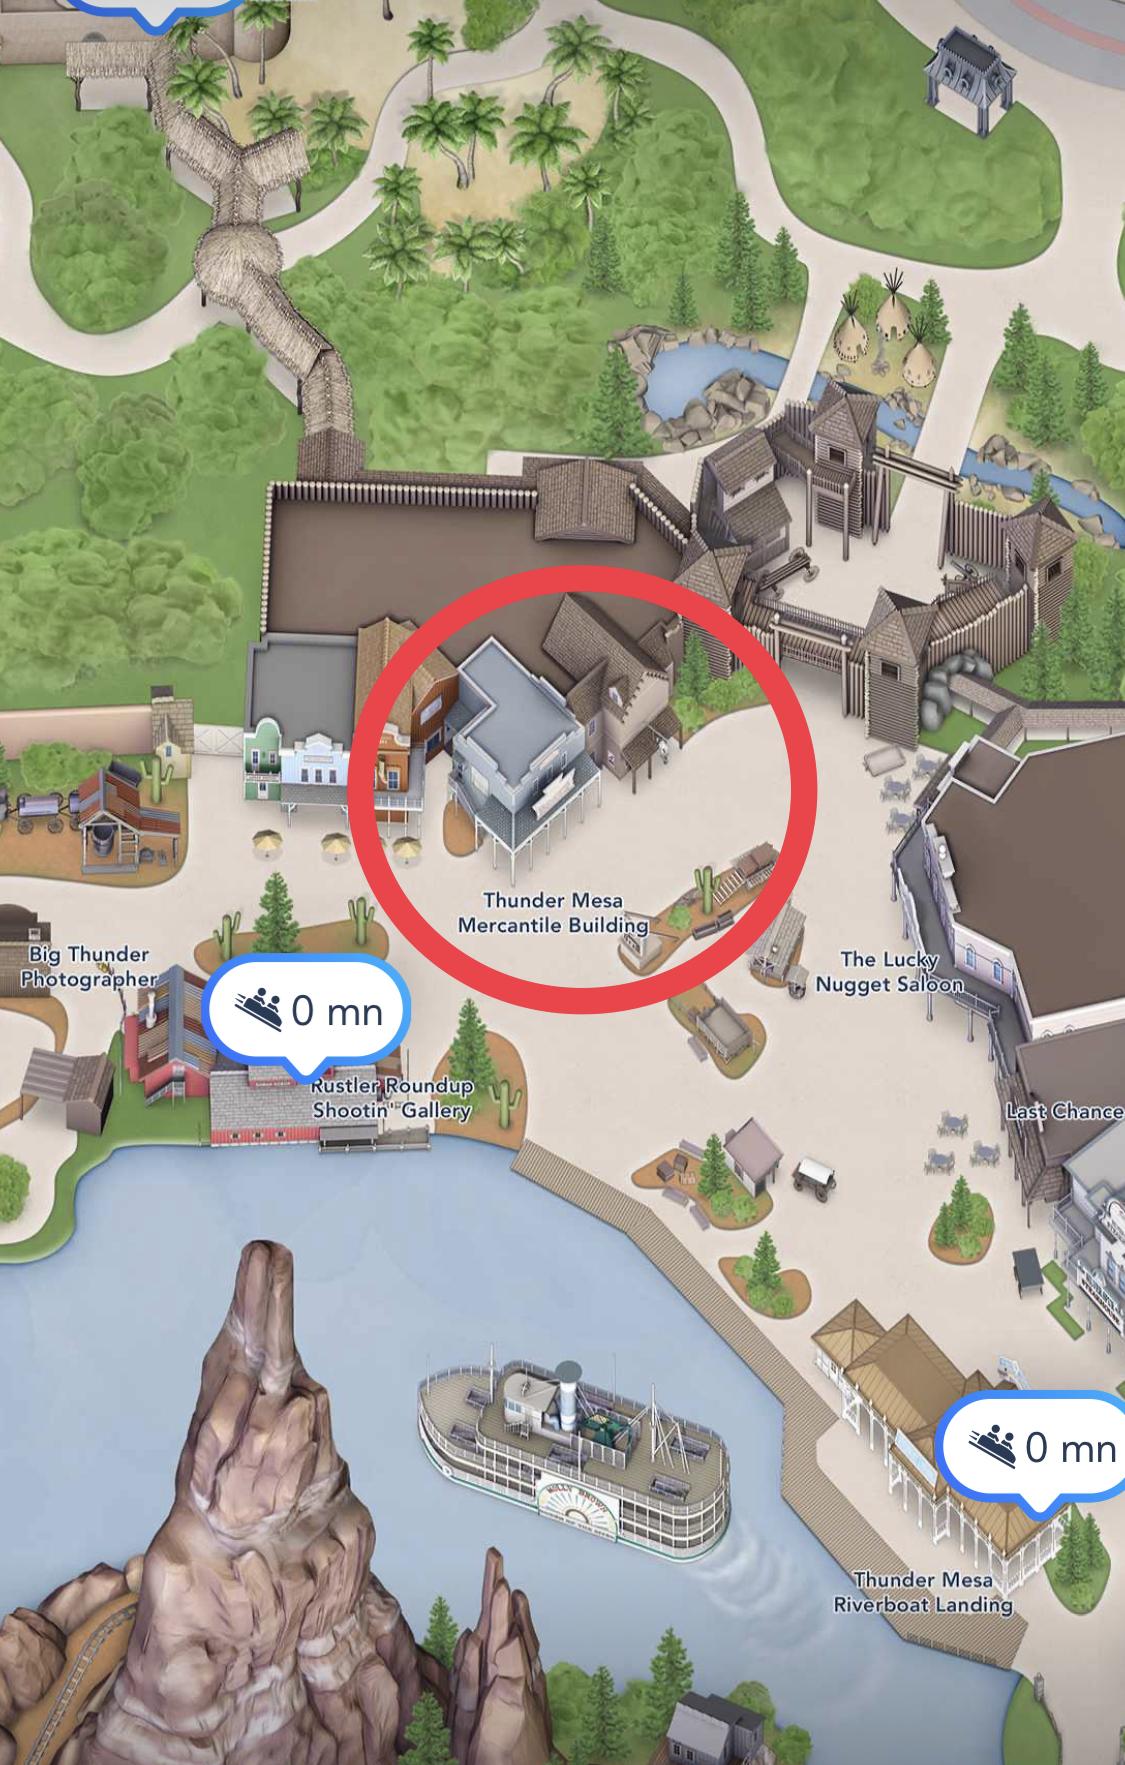 Trading Board Disneyland Paris - Thunder Mesa Mercantile